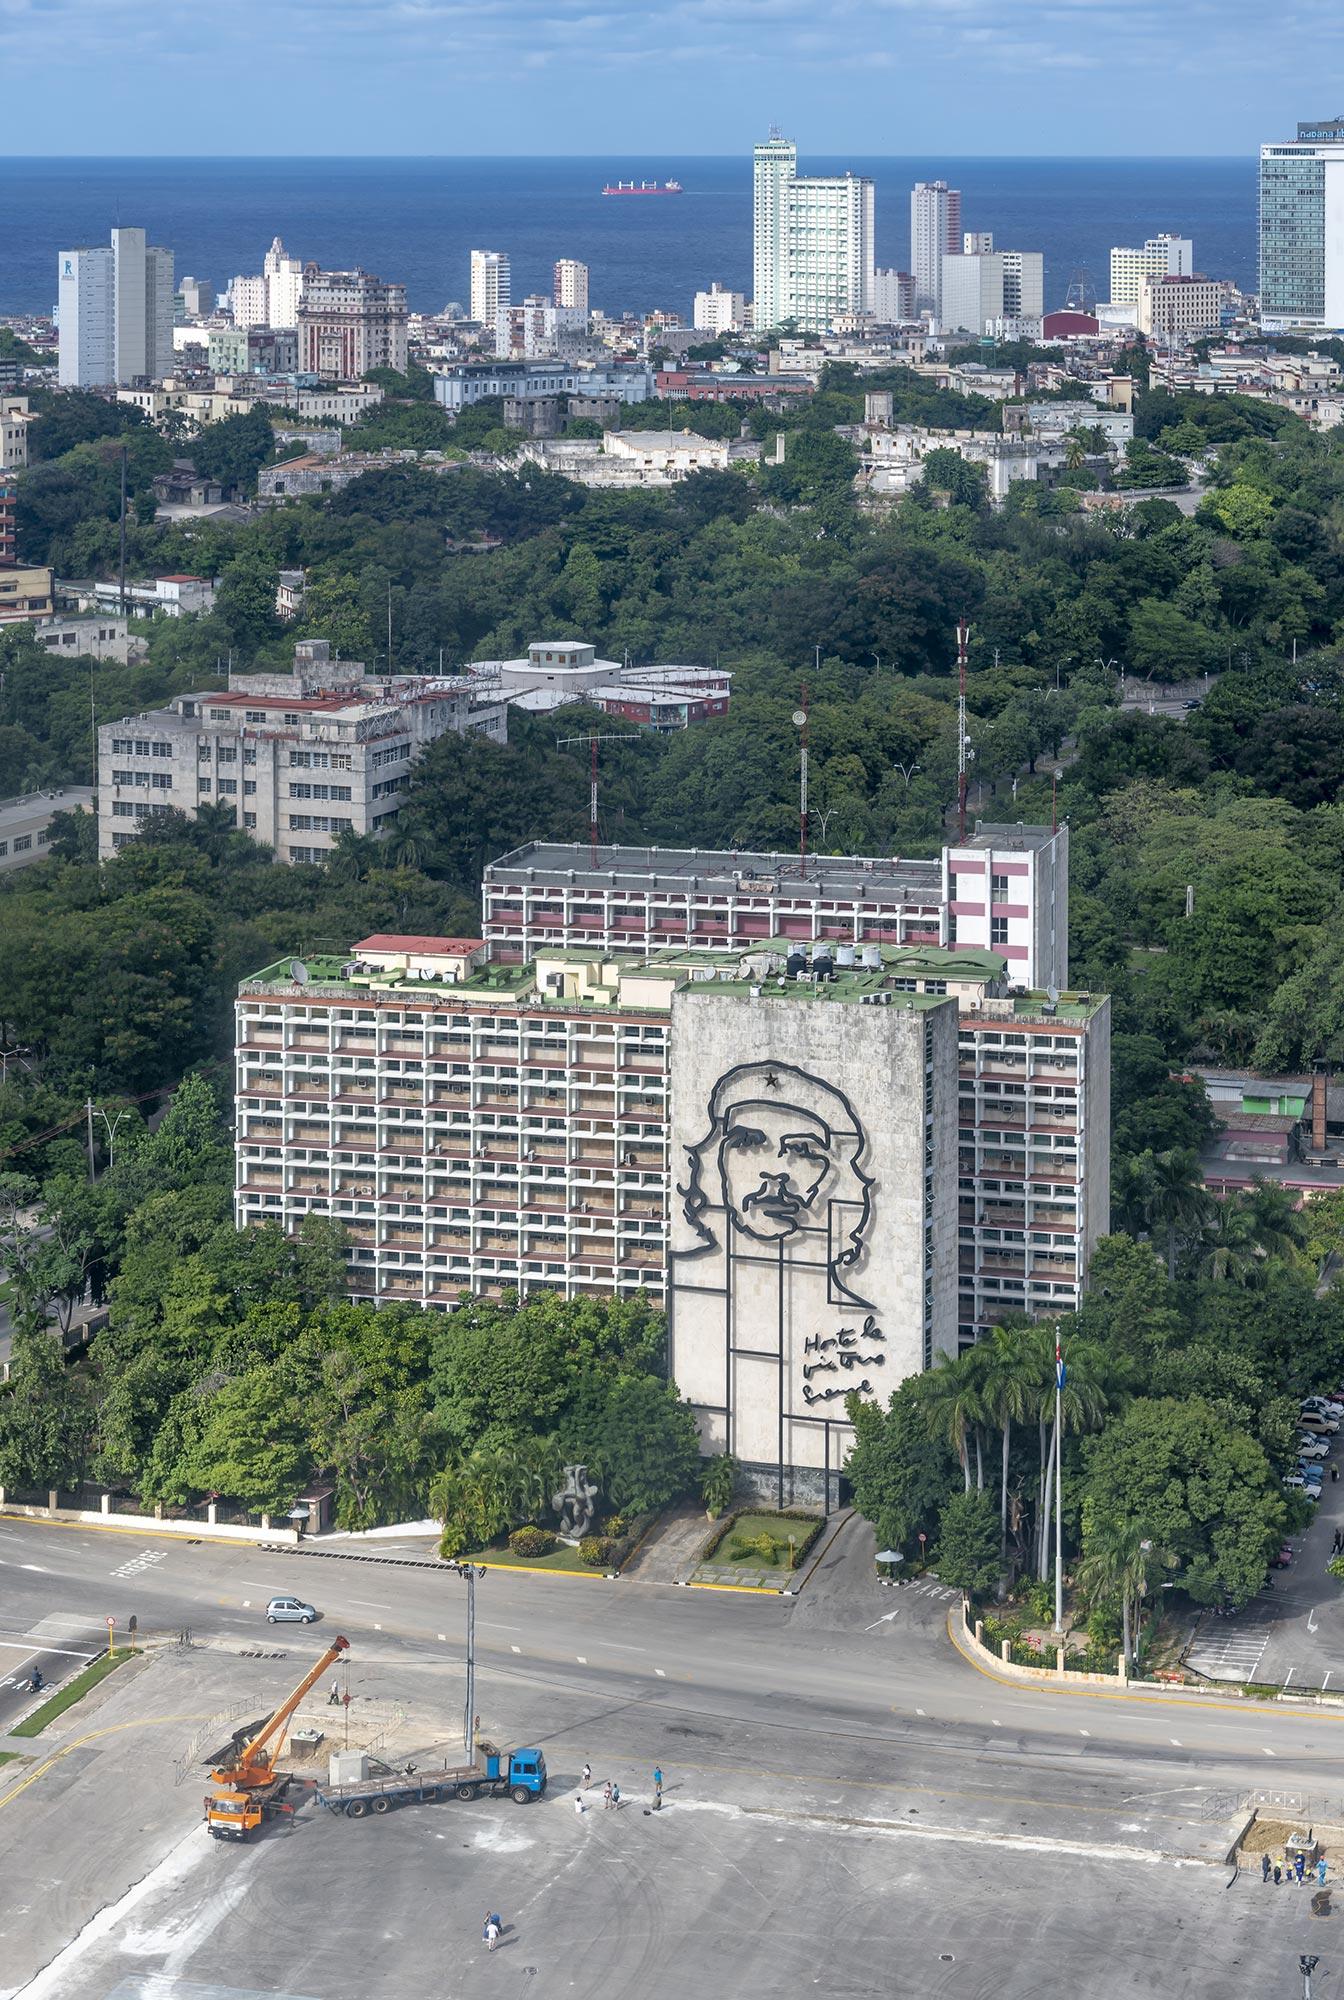 Havana, Cuba. Shot by Colin Walton at WaltonCreative